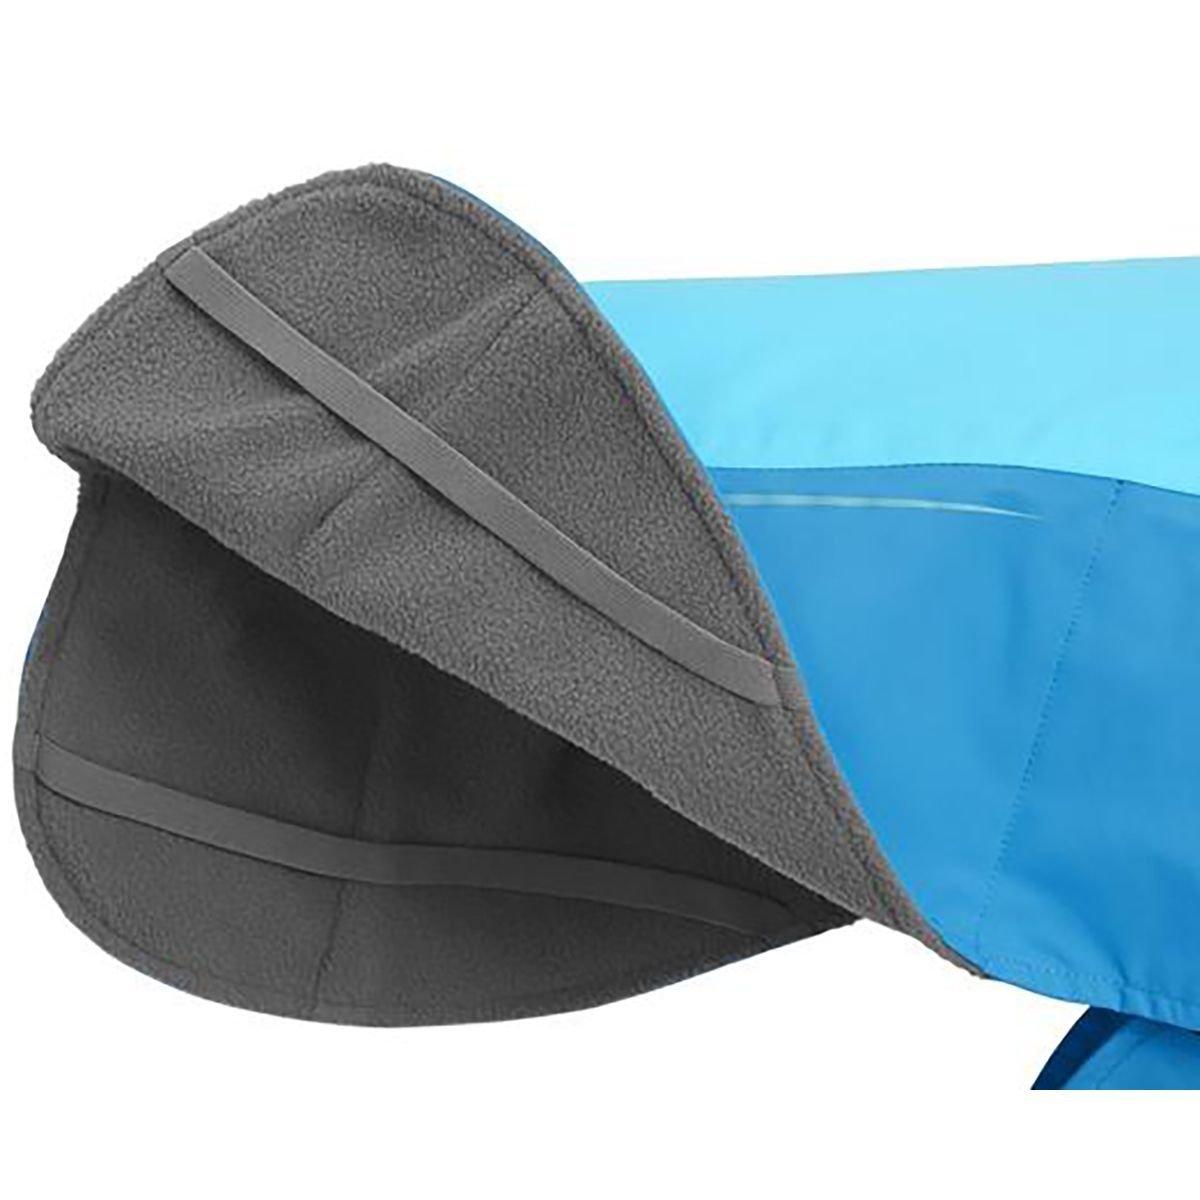 Ruffwear Vert™ Jacke für Hunde, Bild 6